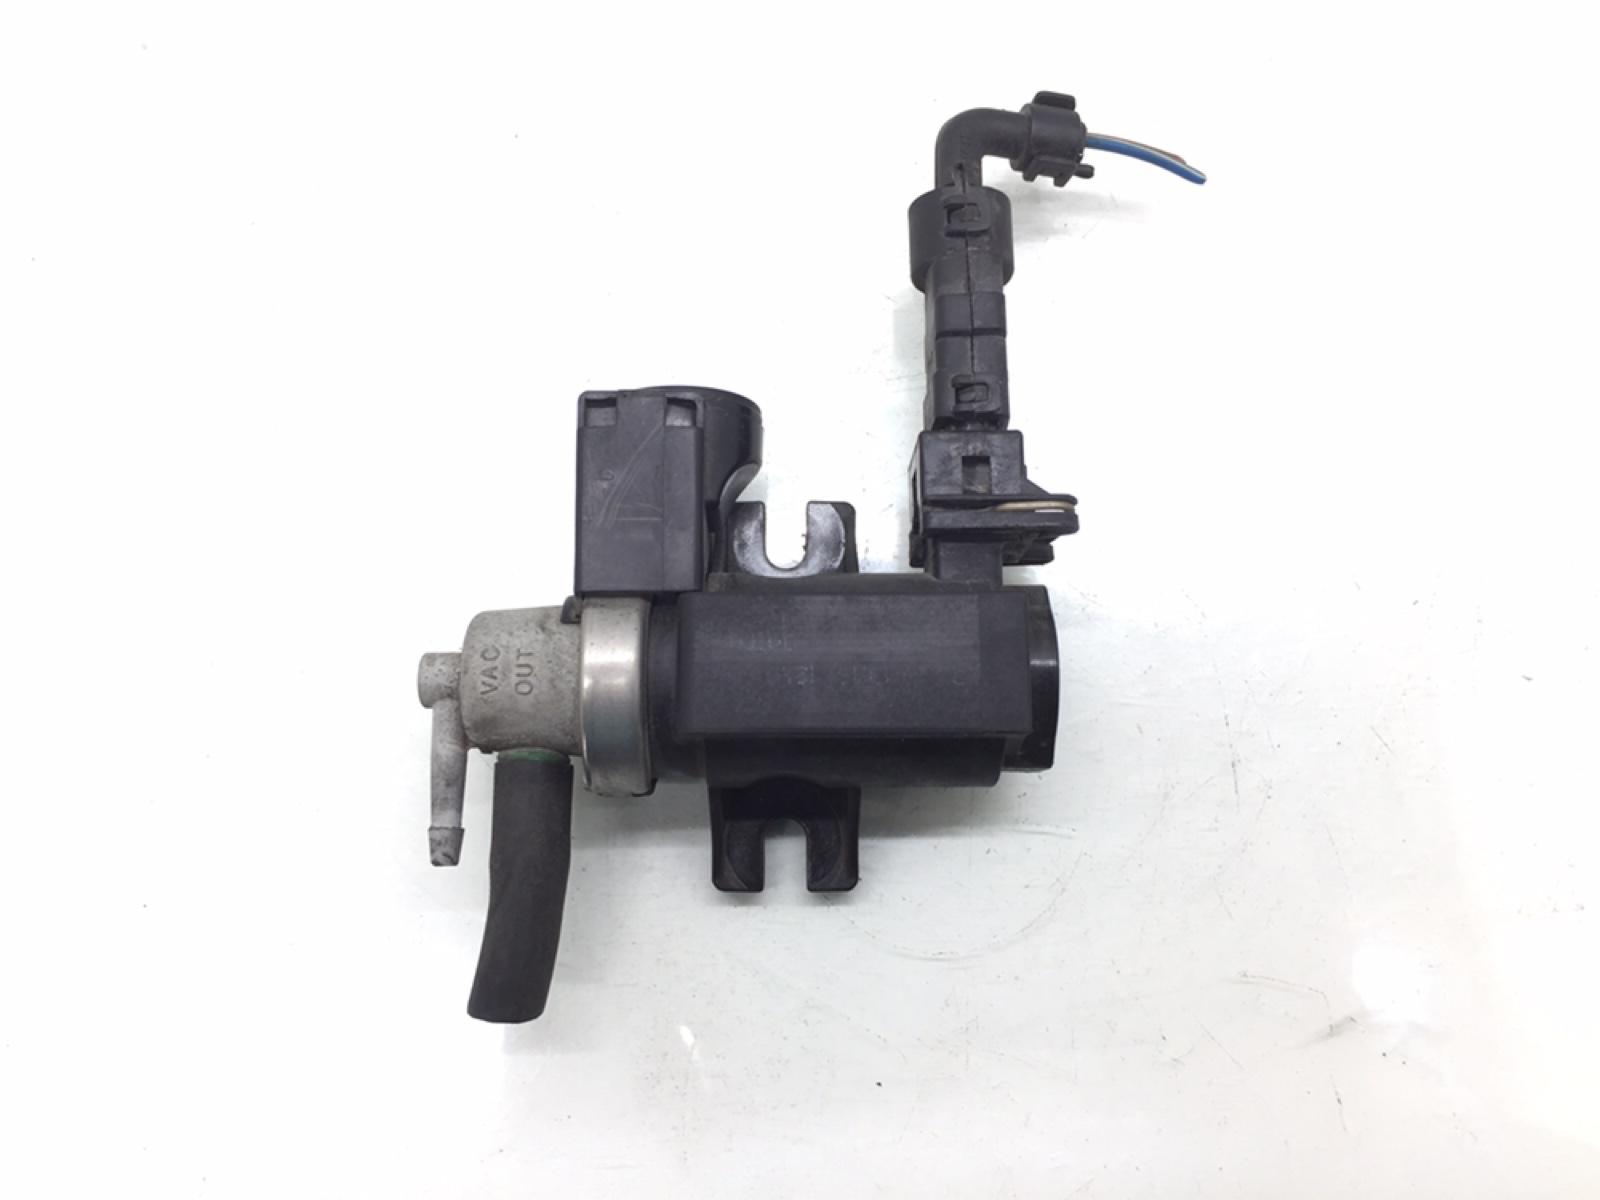 Клапан электромагнитный Kia Sedona 2.9 CRDI 2004 (б/у)